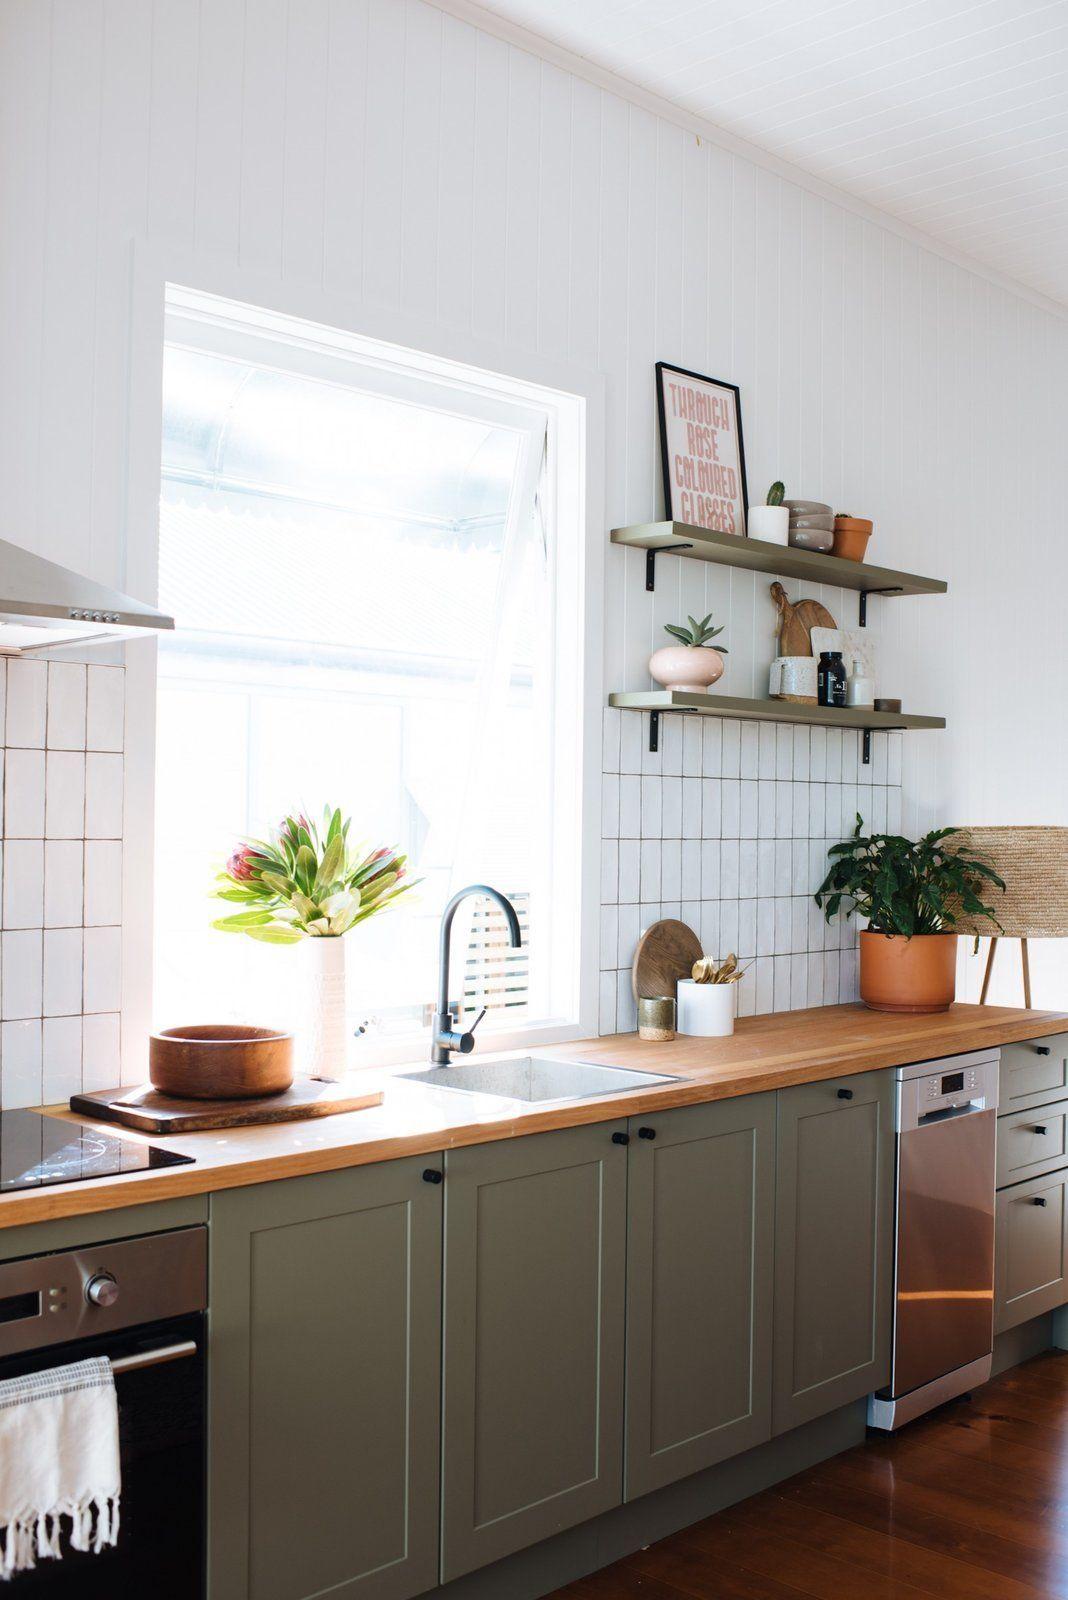 Trend Alert Butcher Block Countertops Cococozy In 2020 Green Kitchen Cabinets Kitchen Renovation Kitchen Design